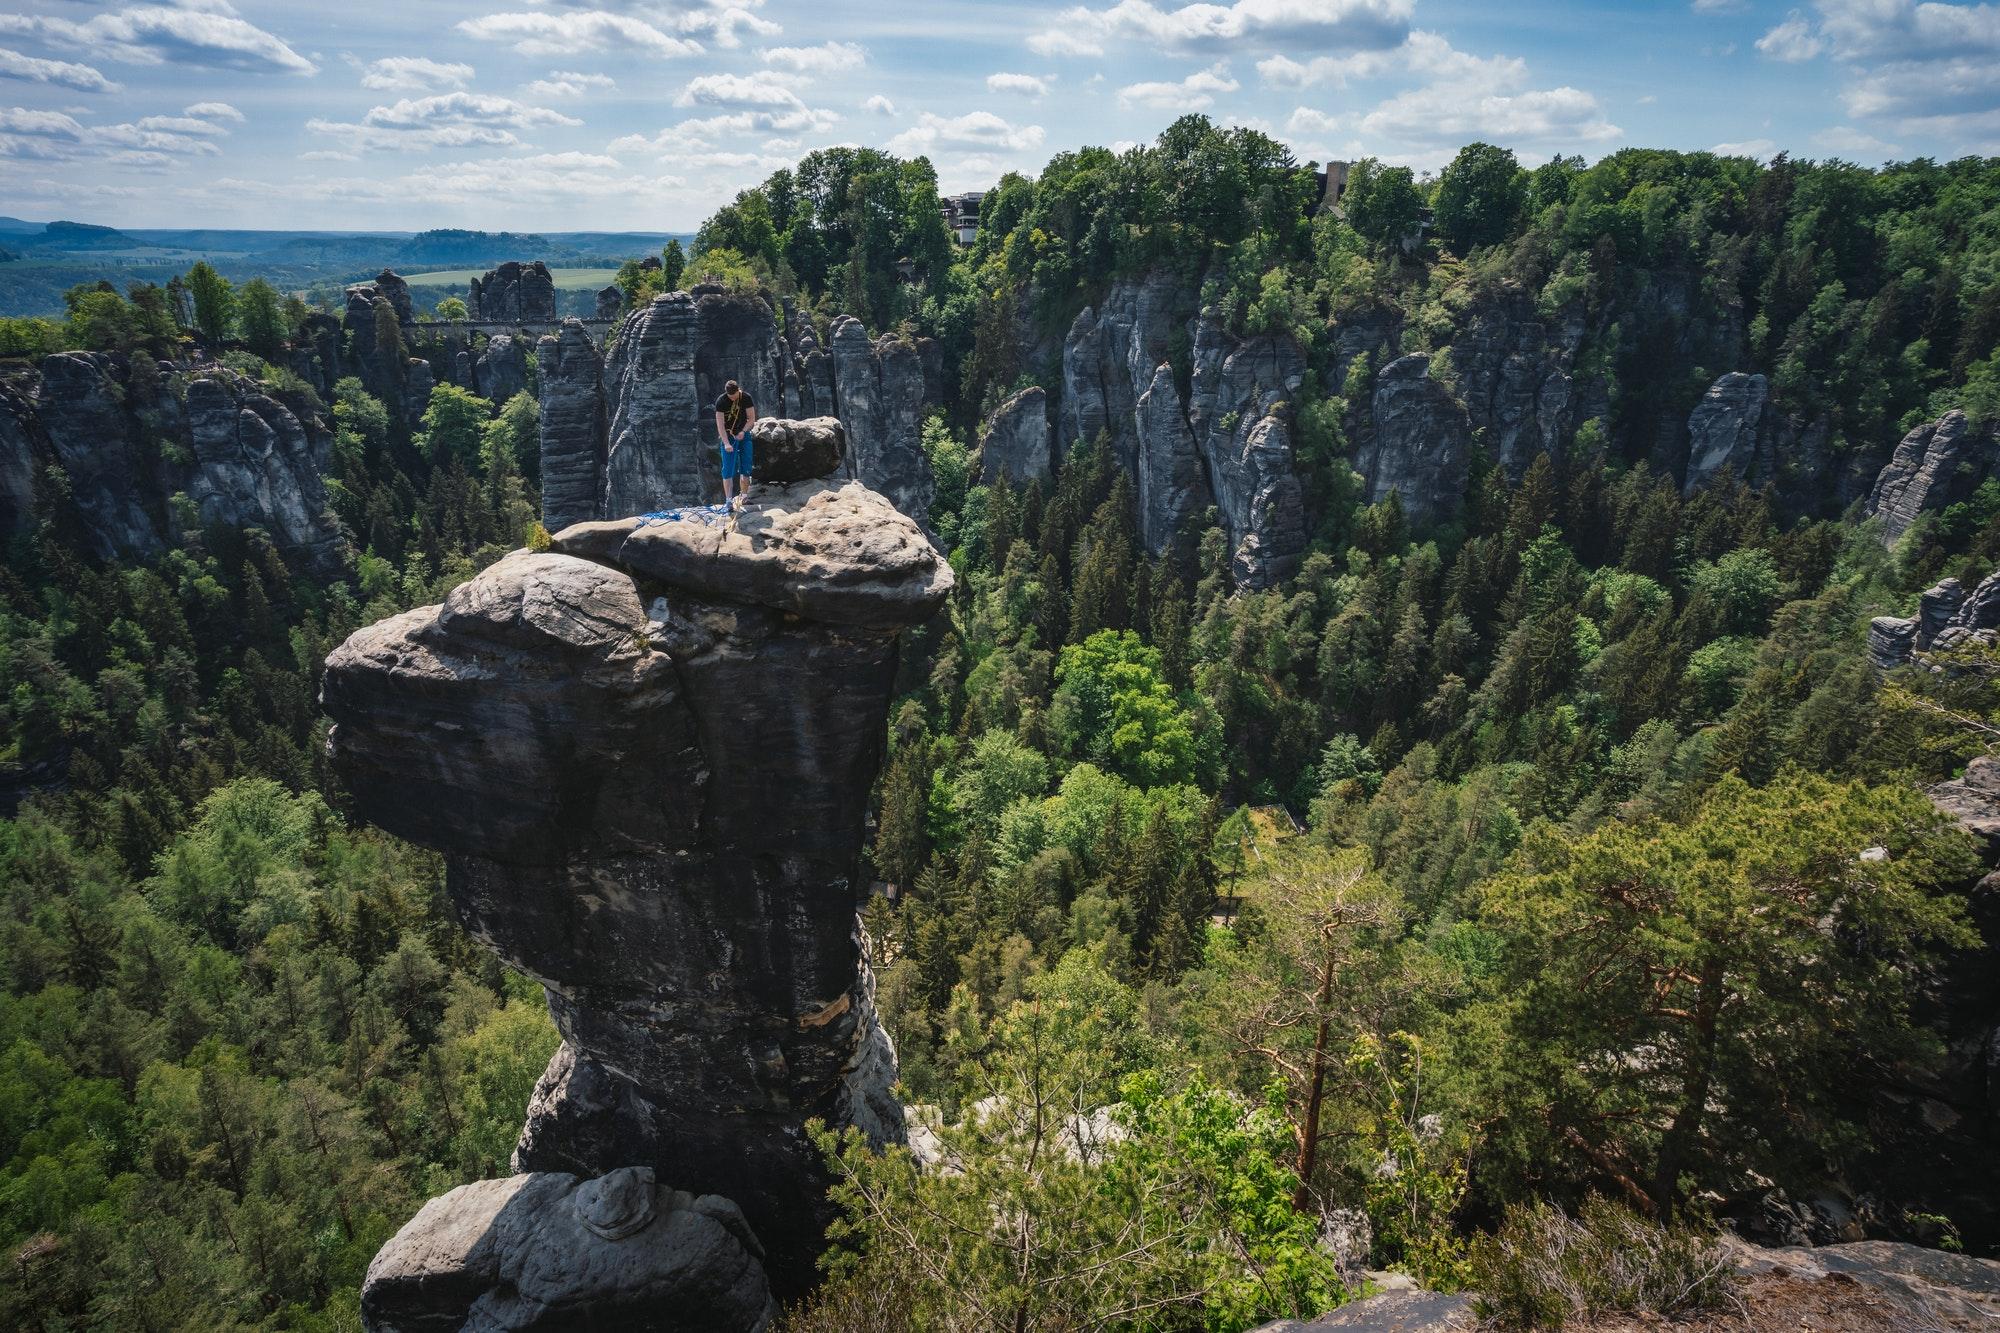 Ferdinandstein with unrecognized climber in famous Bastei national park Saxon Switzerland, Germany